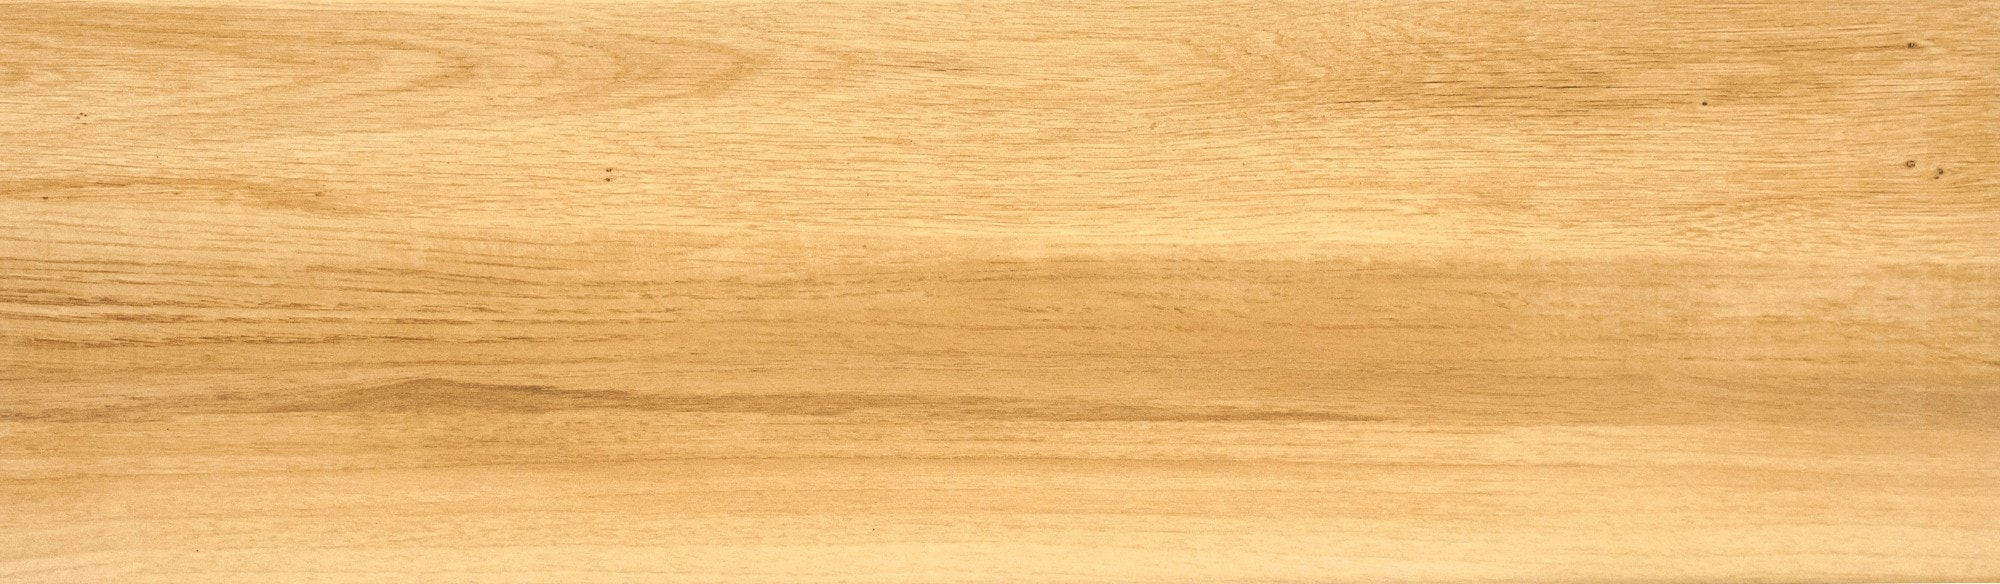 Płytka podłogowa Cerrad Mustiq Desert 600x175x8mm 14376